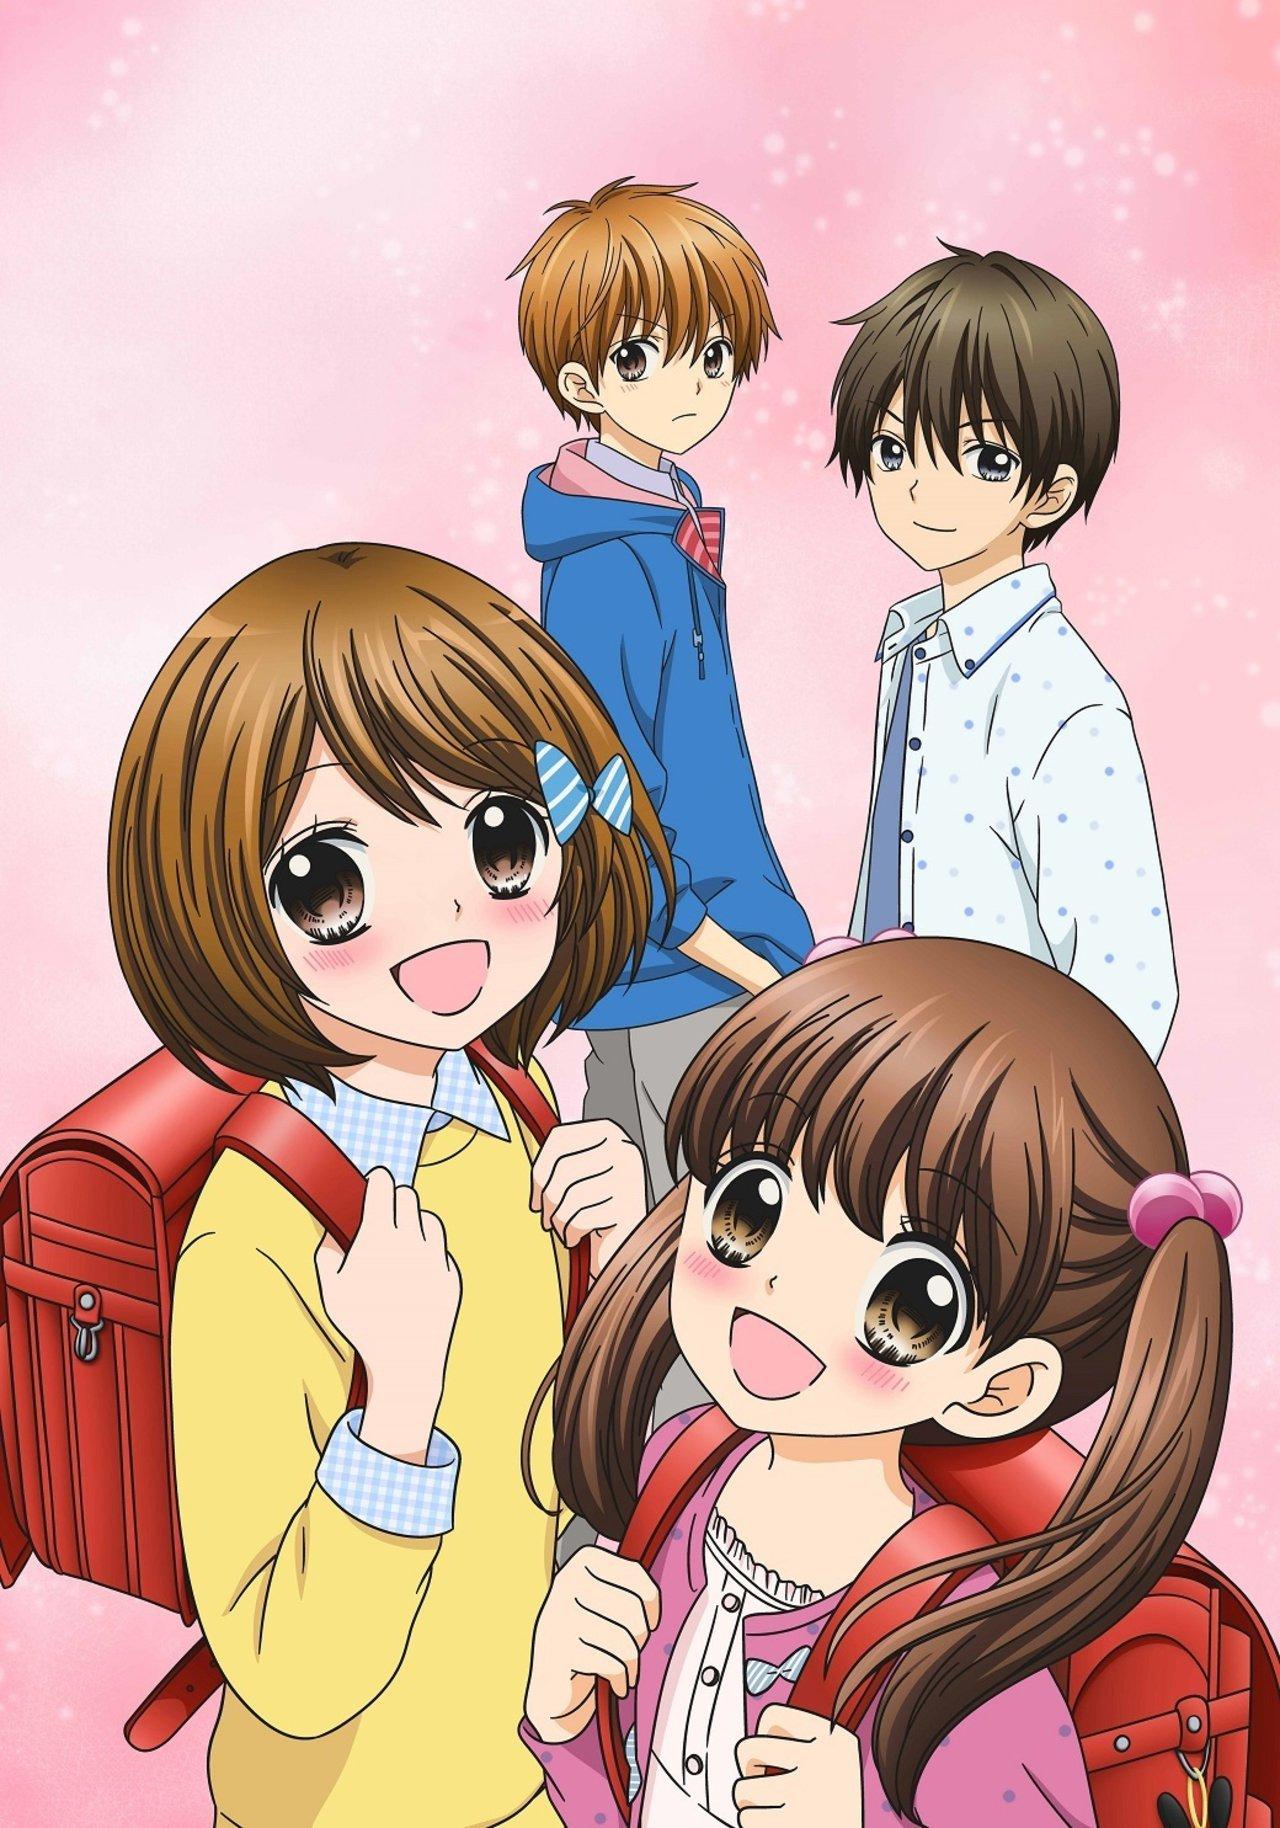 http://www.animezonedex.com/2021/07/12-sai-chicchana-mune-no-tokimeki.html